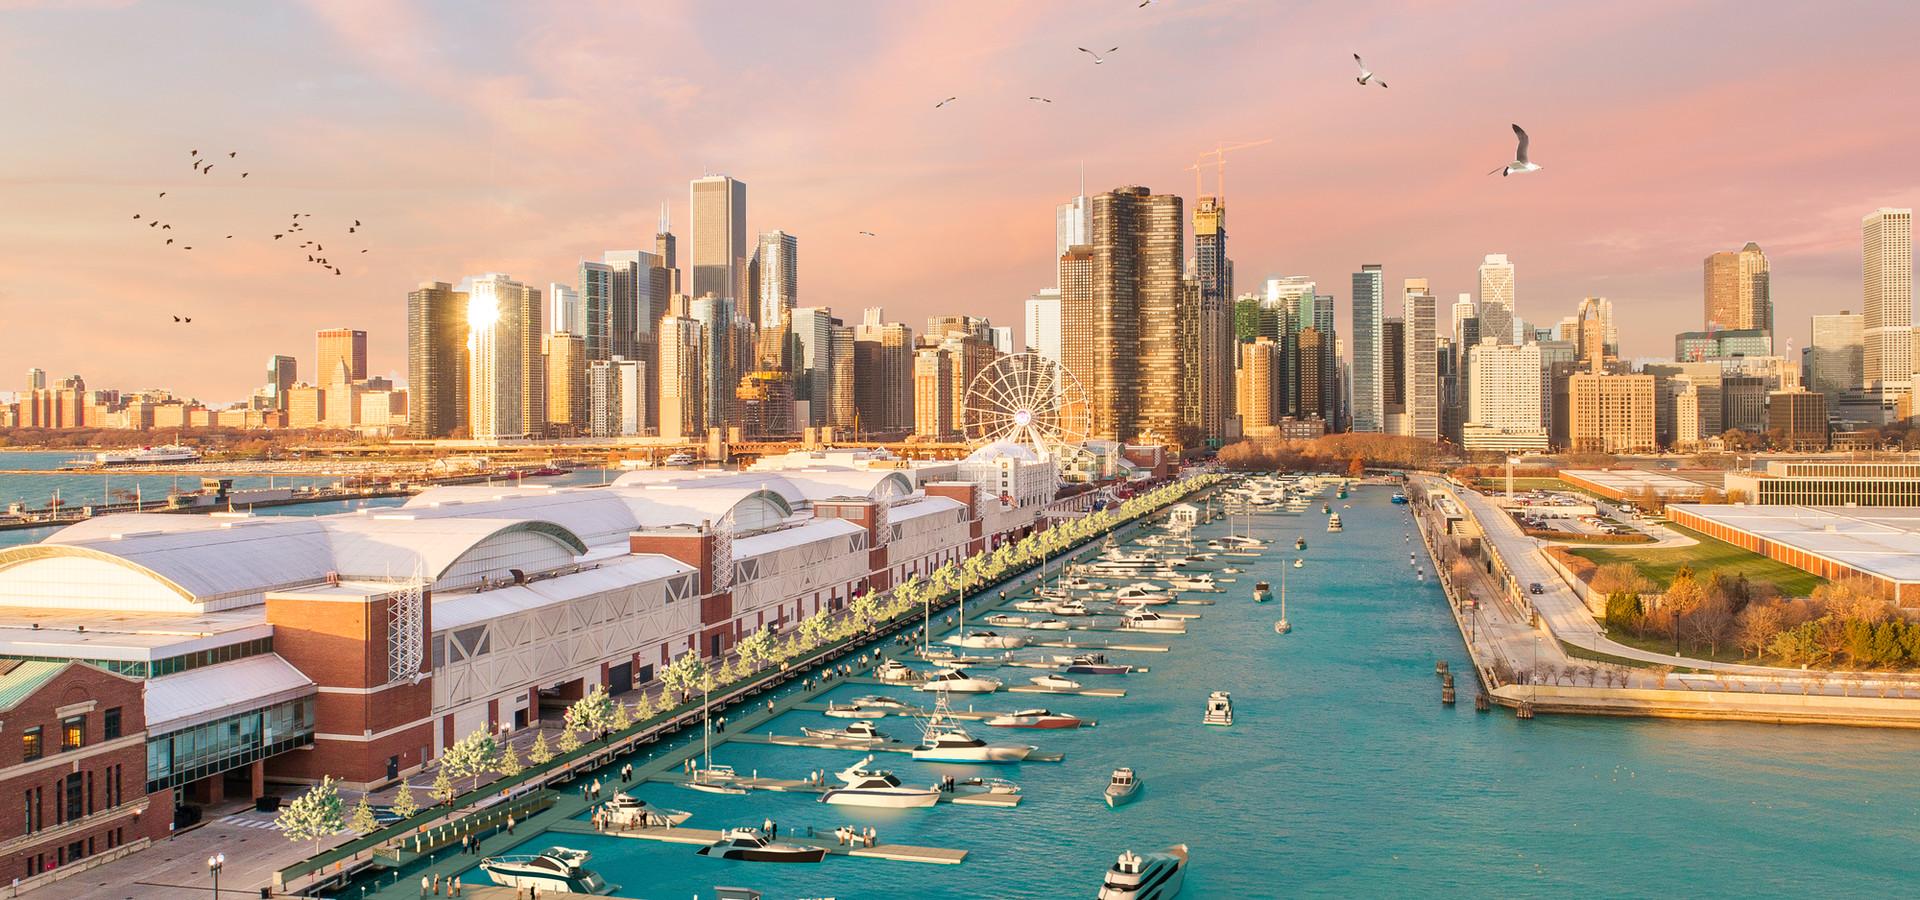 Navy Pier Marina | Chicago, IL